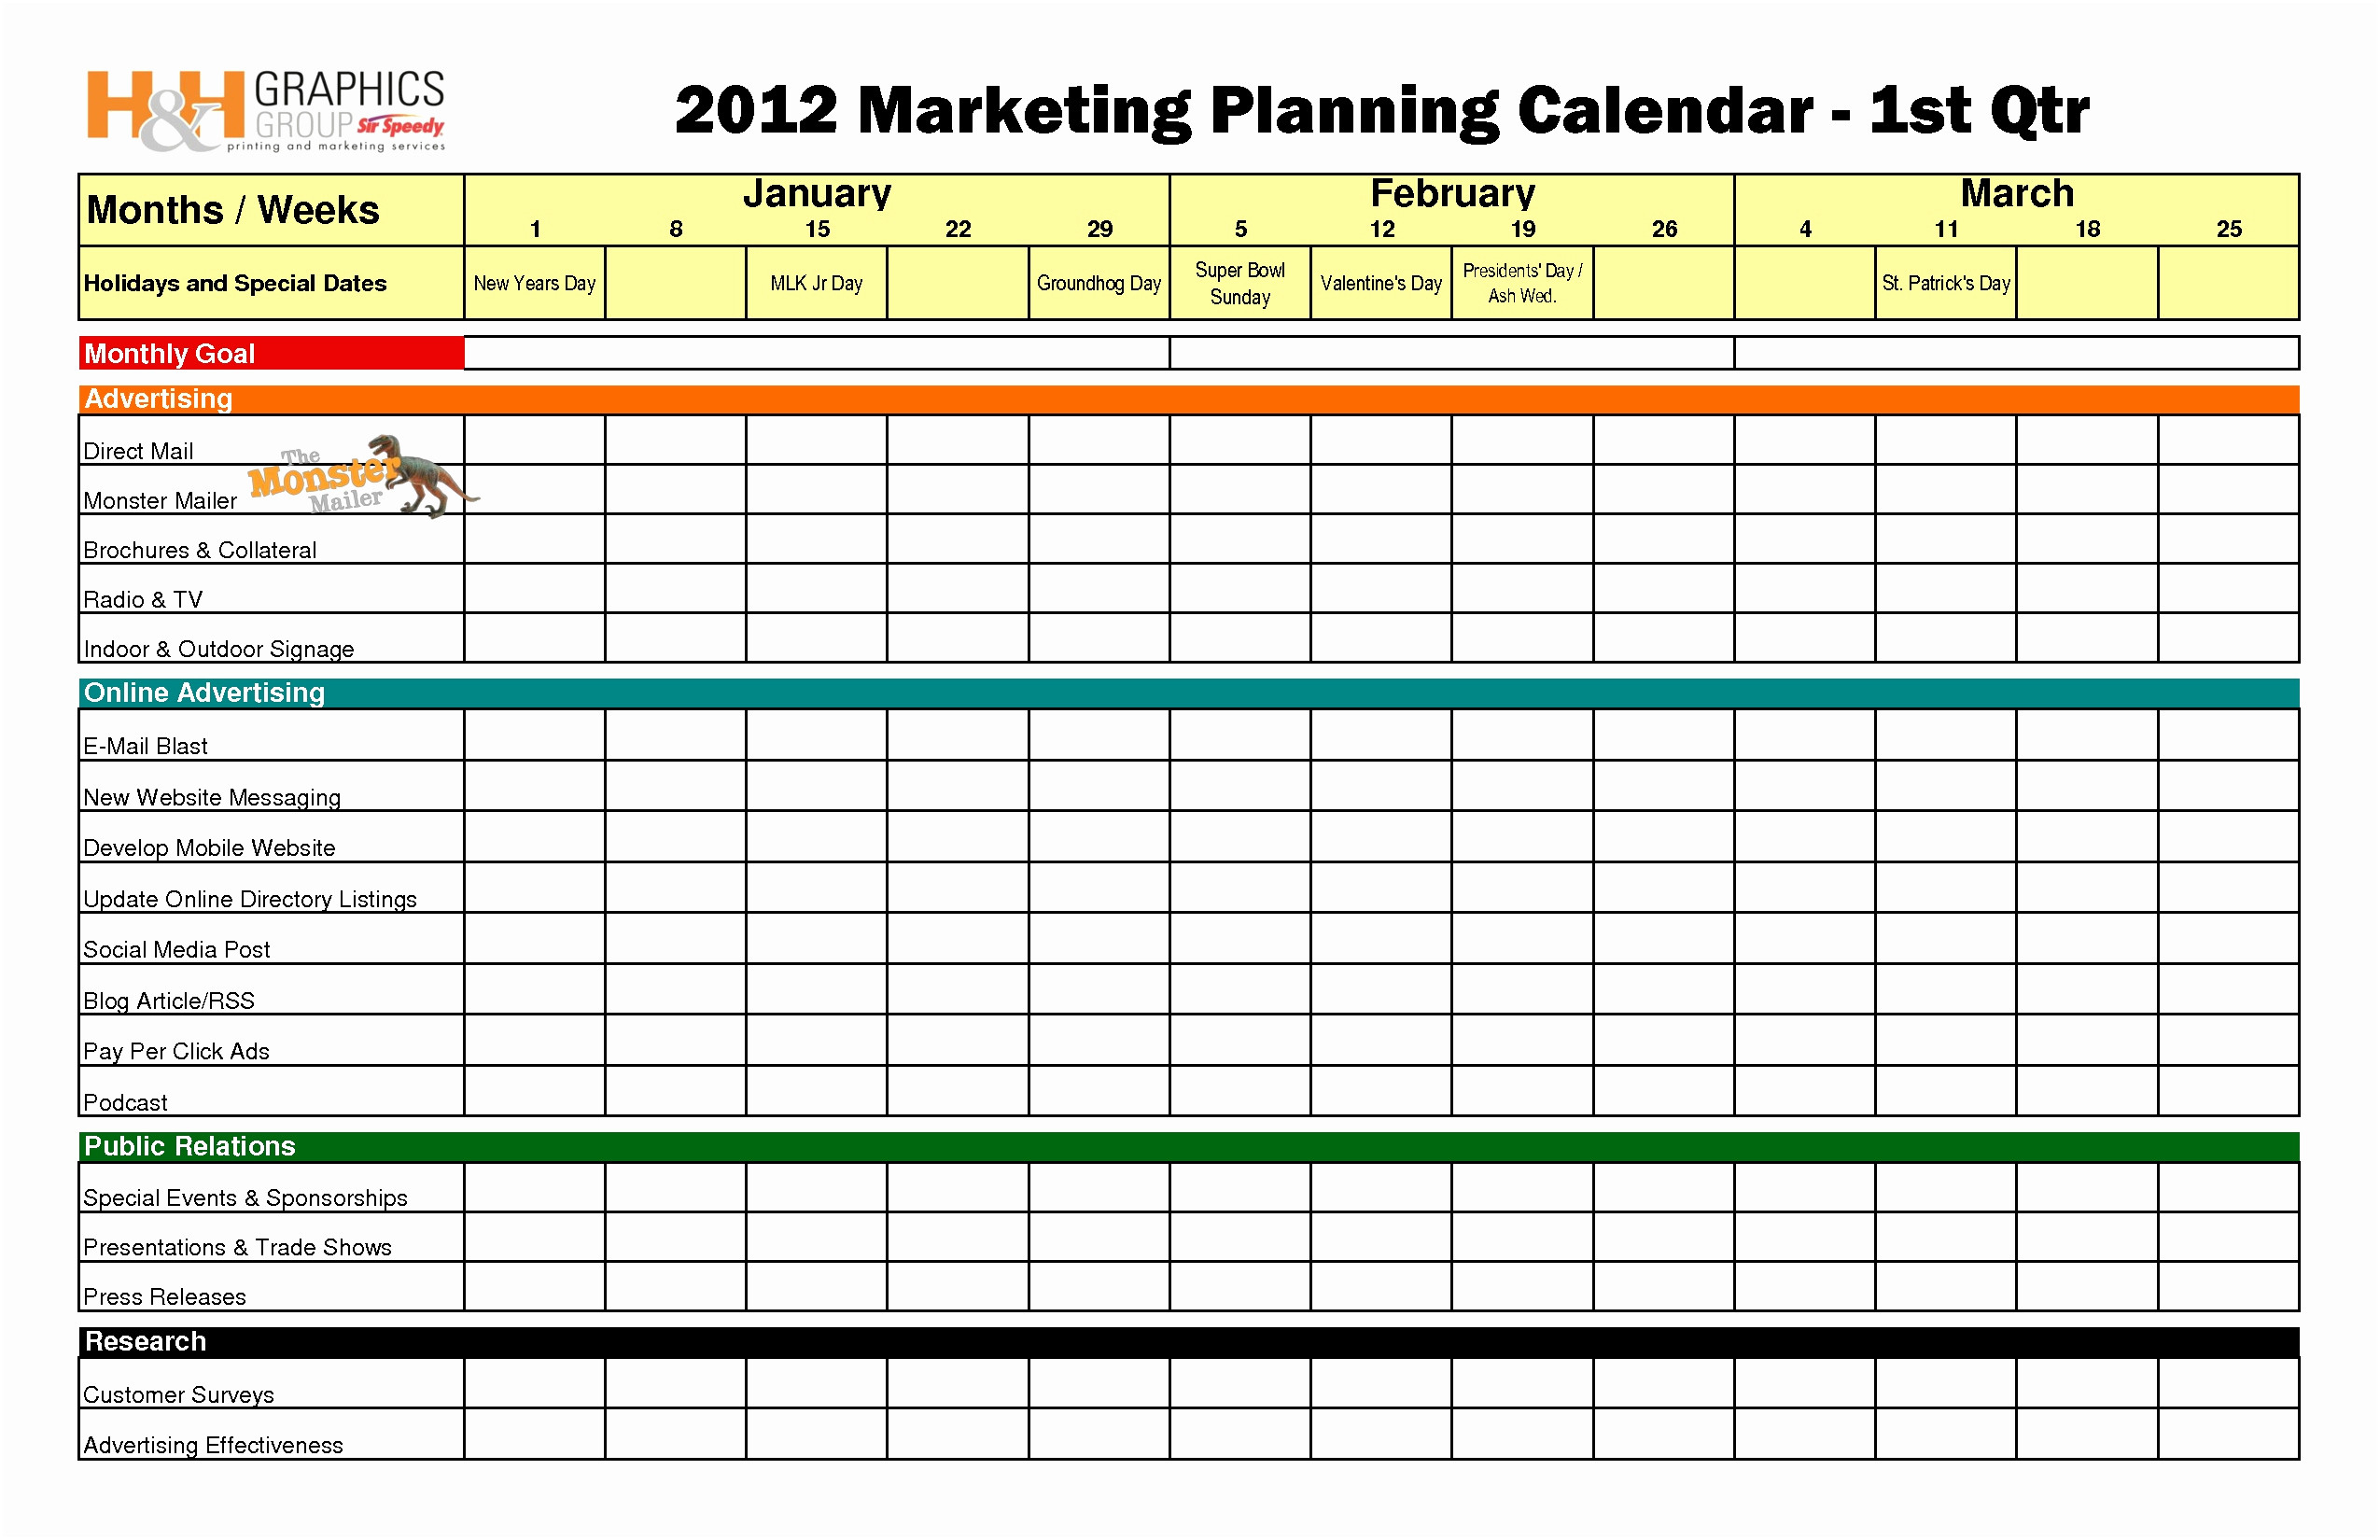 Google Spreadsheet Calendar Template 2018 With Regard To Google Docs Calendar Spreadsheet Template Luxury Excel Calendar 2018